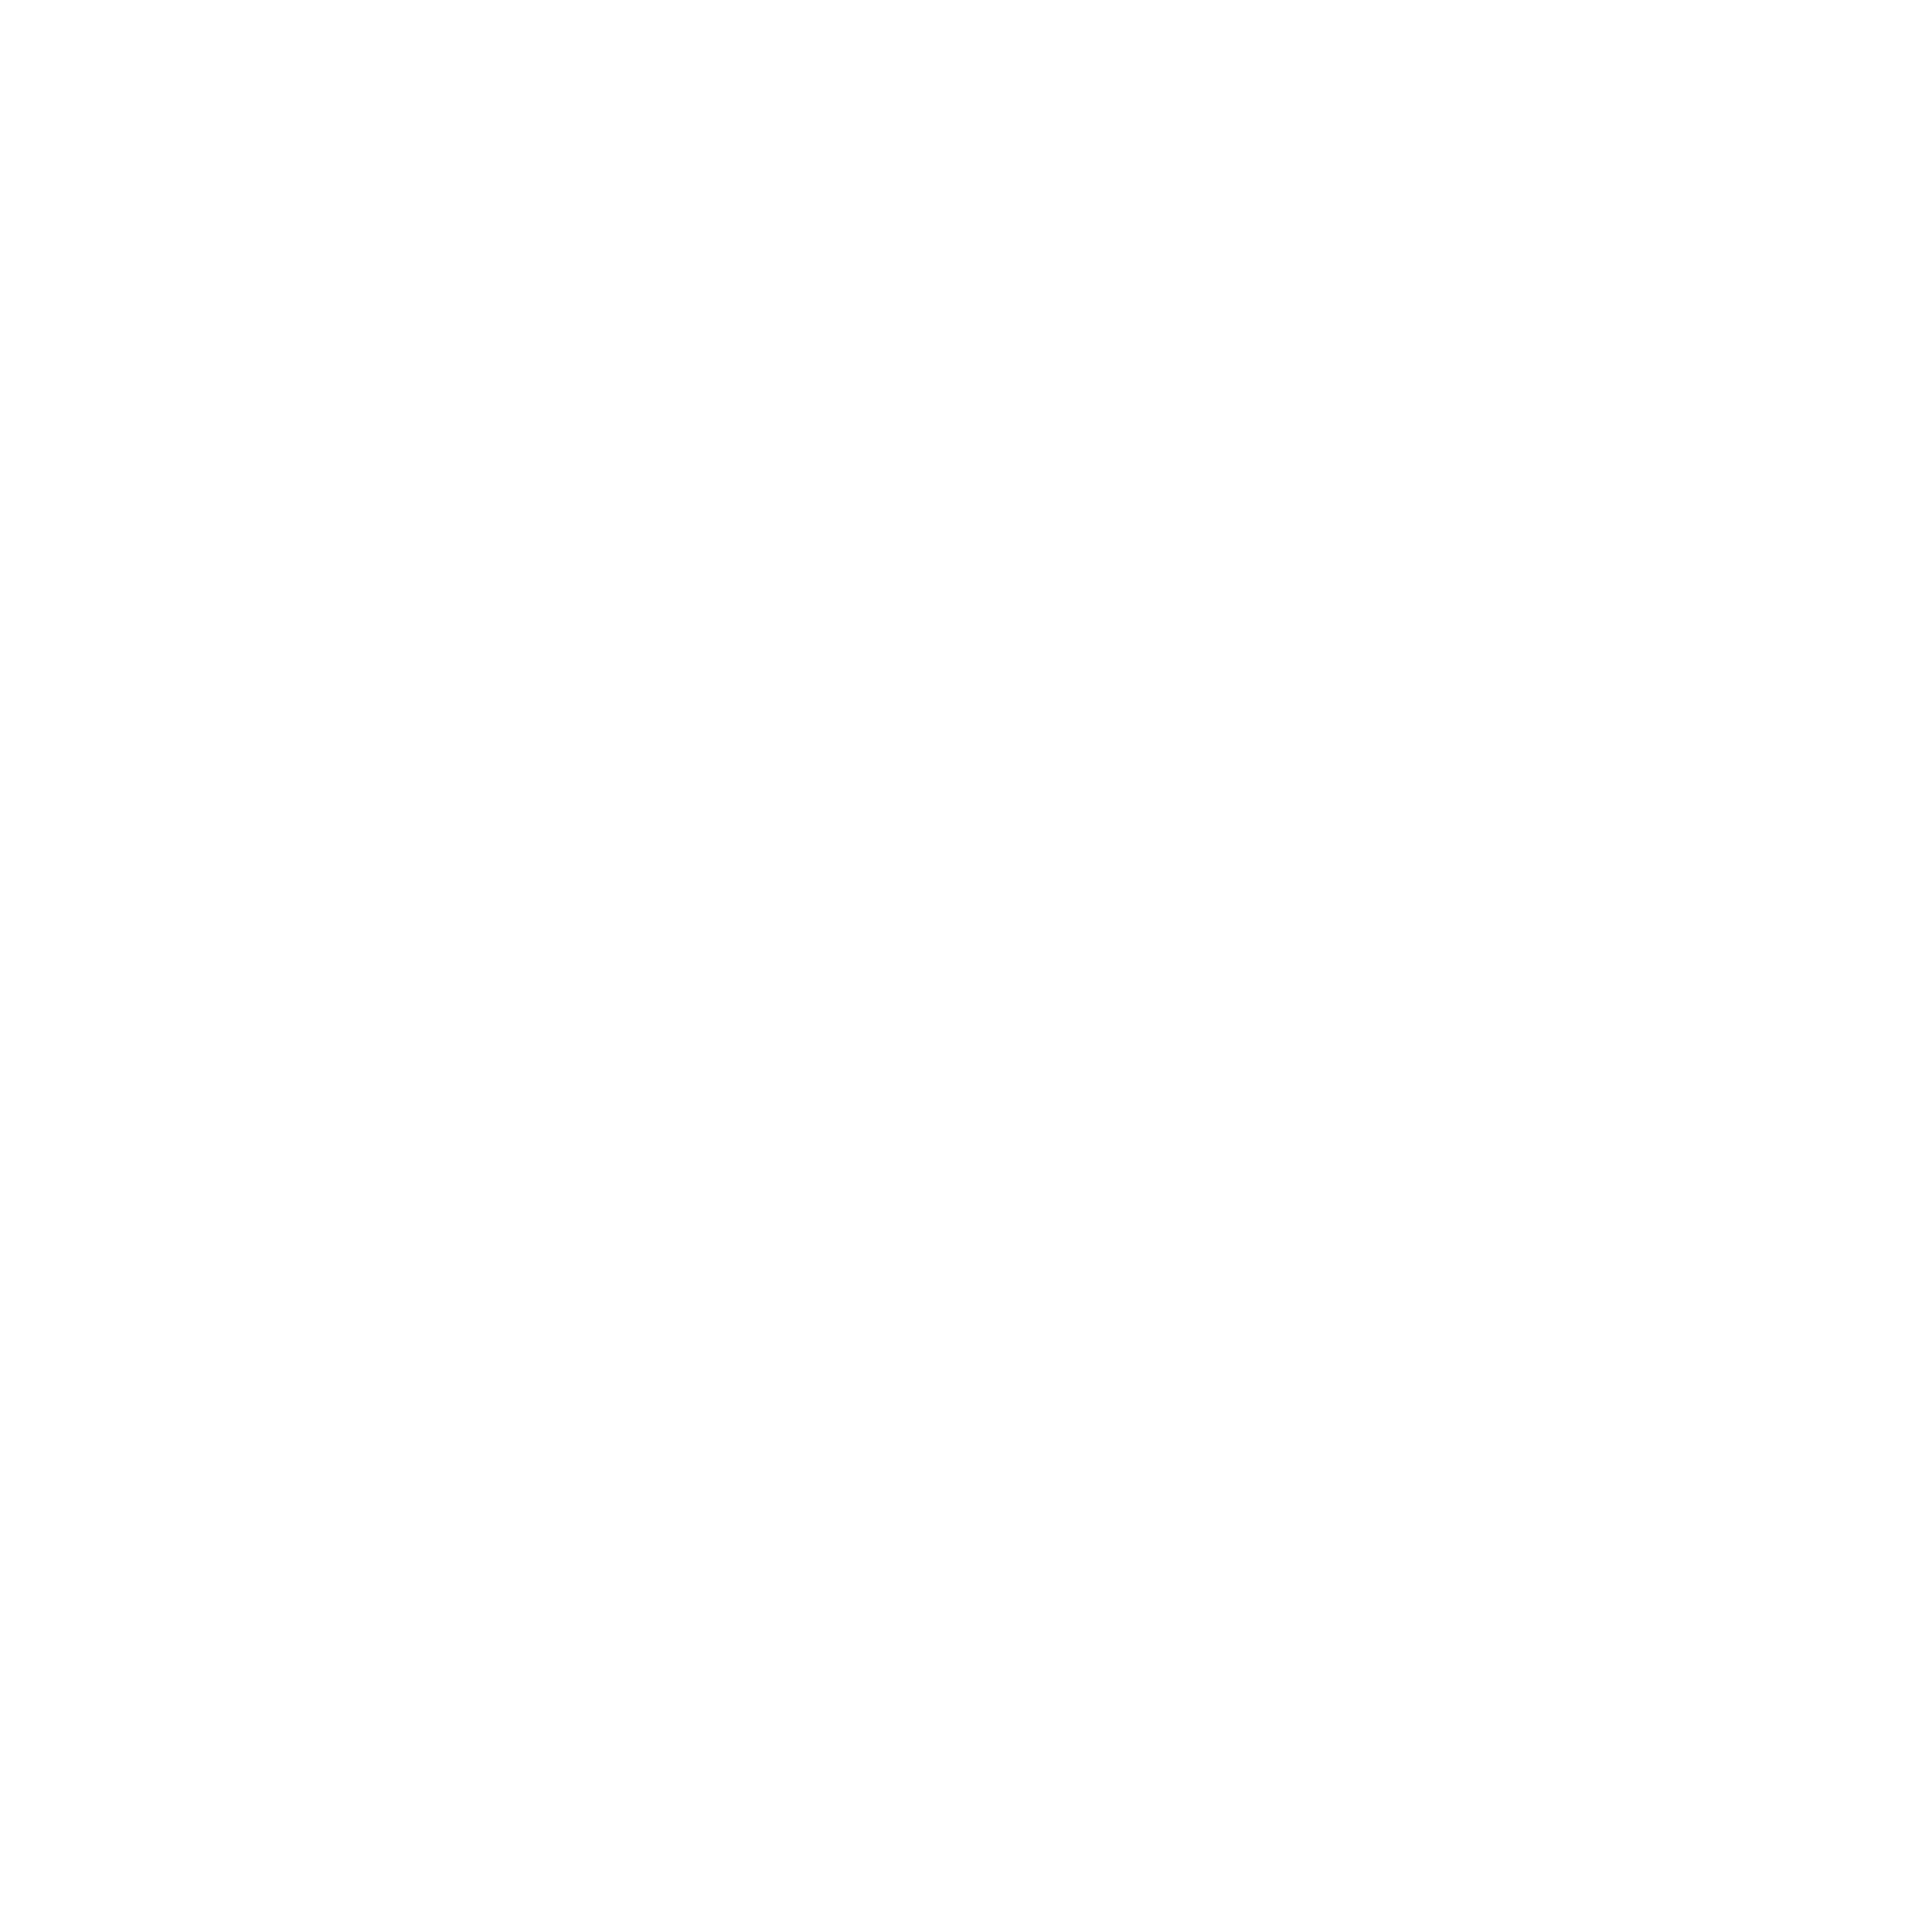 Slattery Tackett Architecture